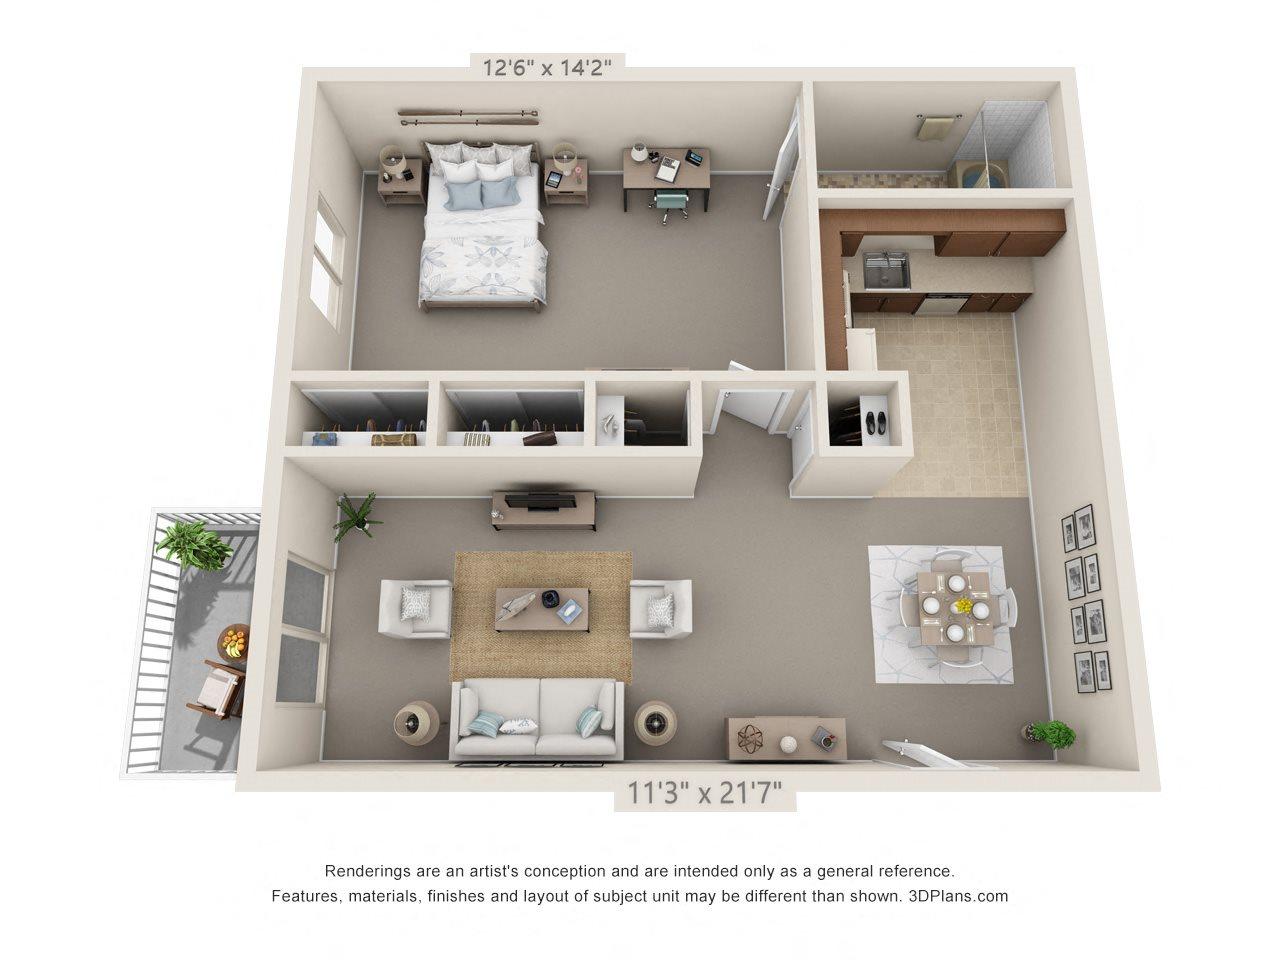 1 Bedroom, 1 Bath (Patio) Floor Plan 1